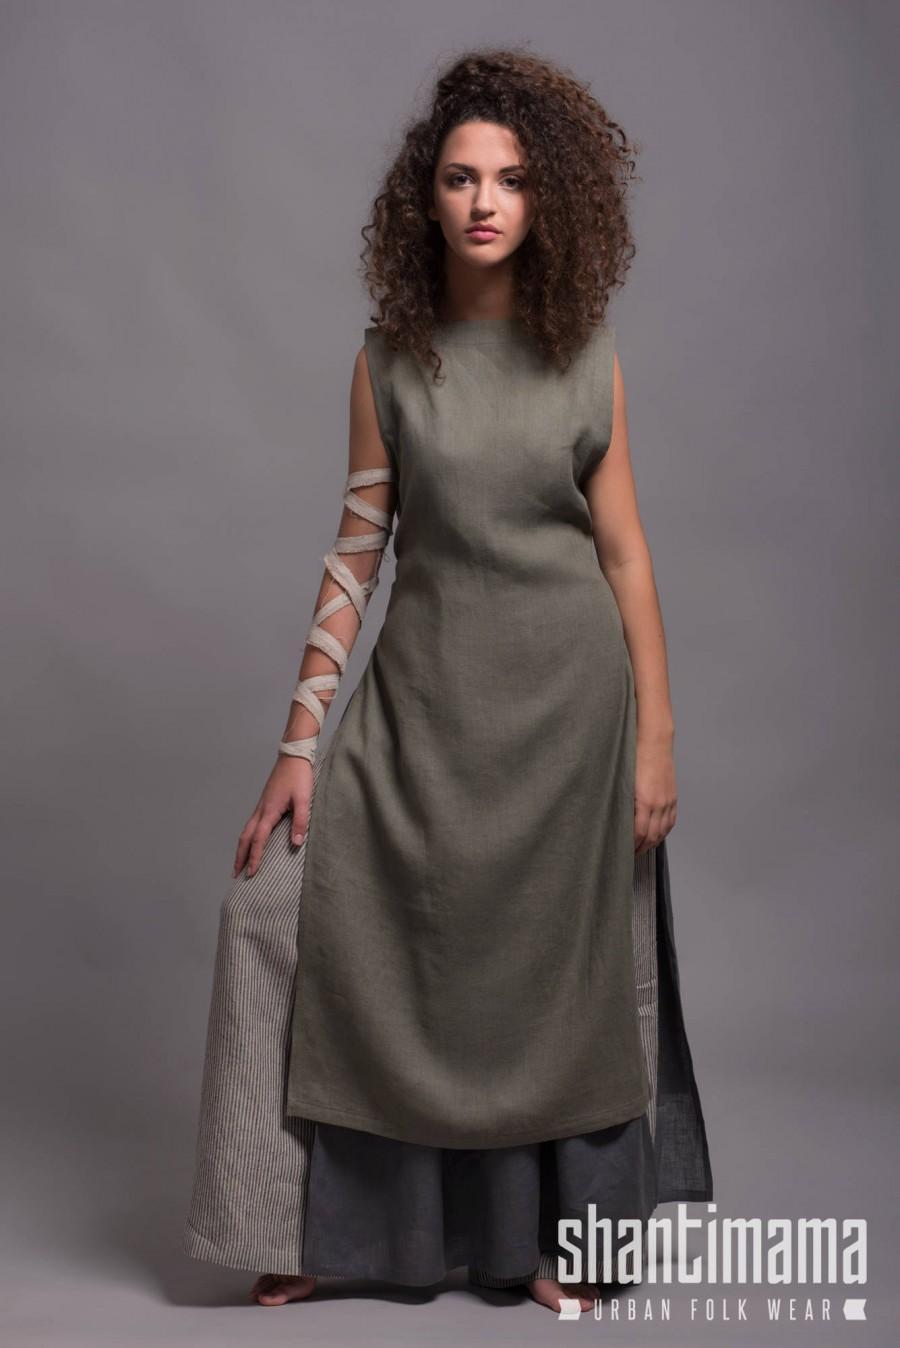 Mariage - Outfit - 3 pieces - Wide Leg Linen Pants BORA + Long Linen Tunic Dress NERO + Linen Apron Dress LINAS,  Washed Soft Linen Flax Women Clothes